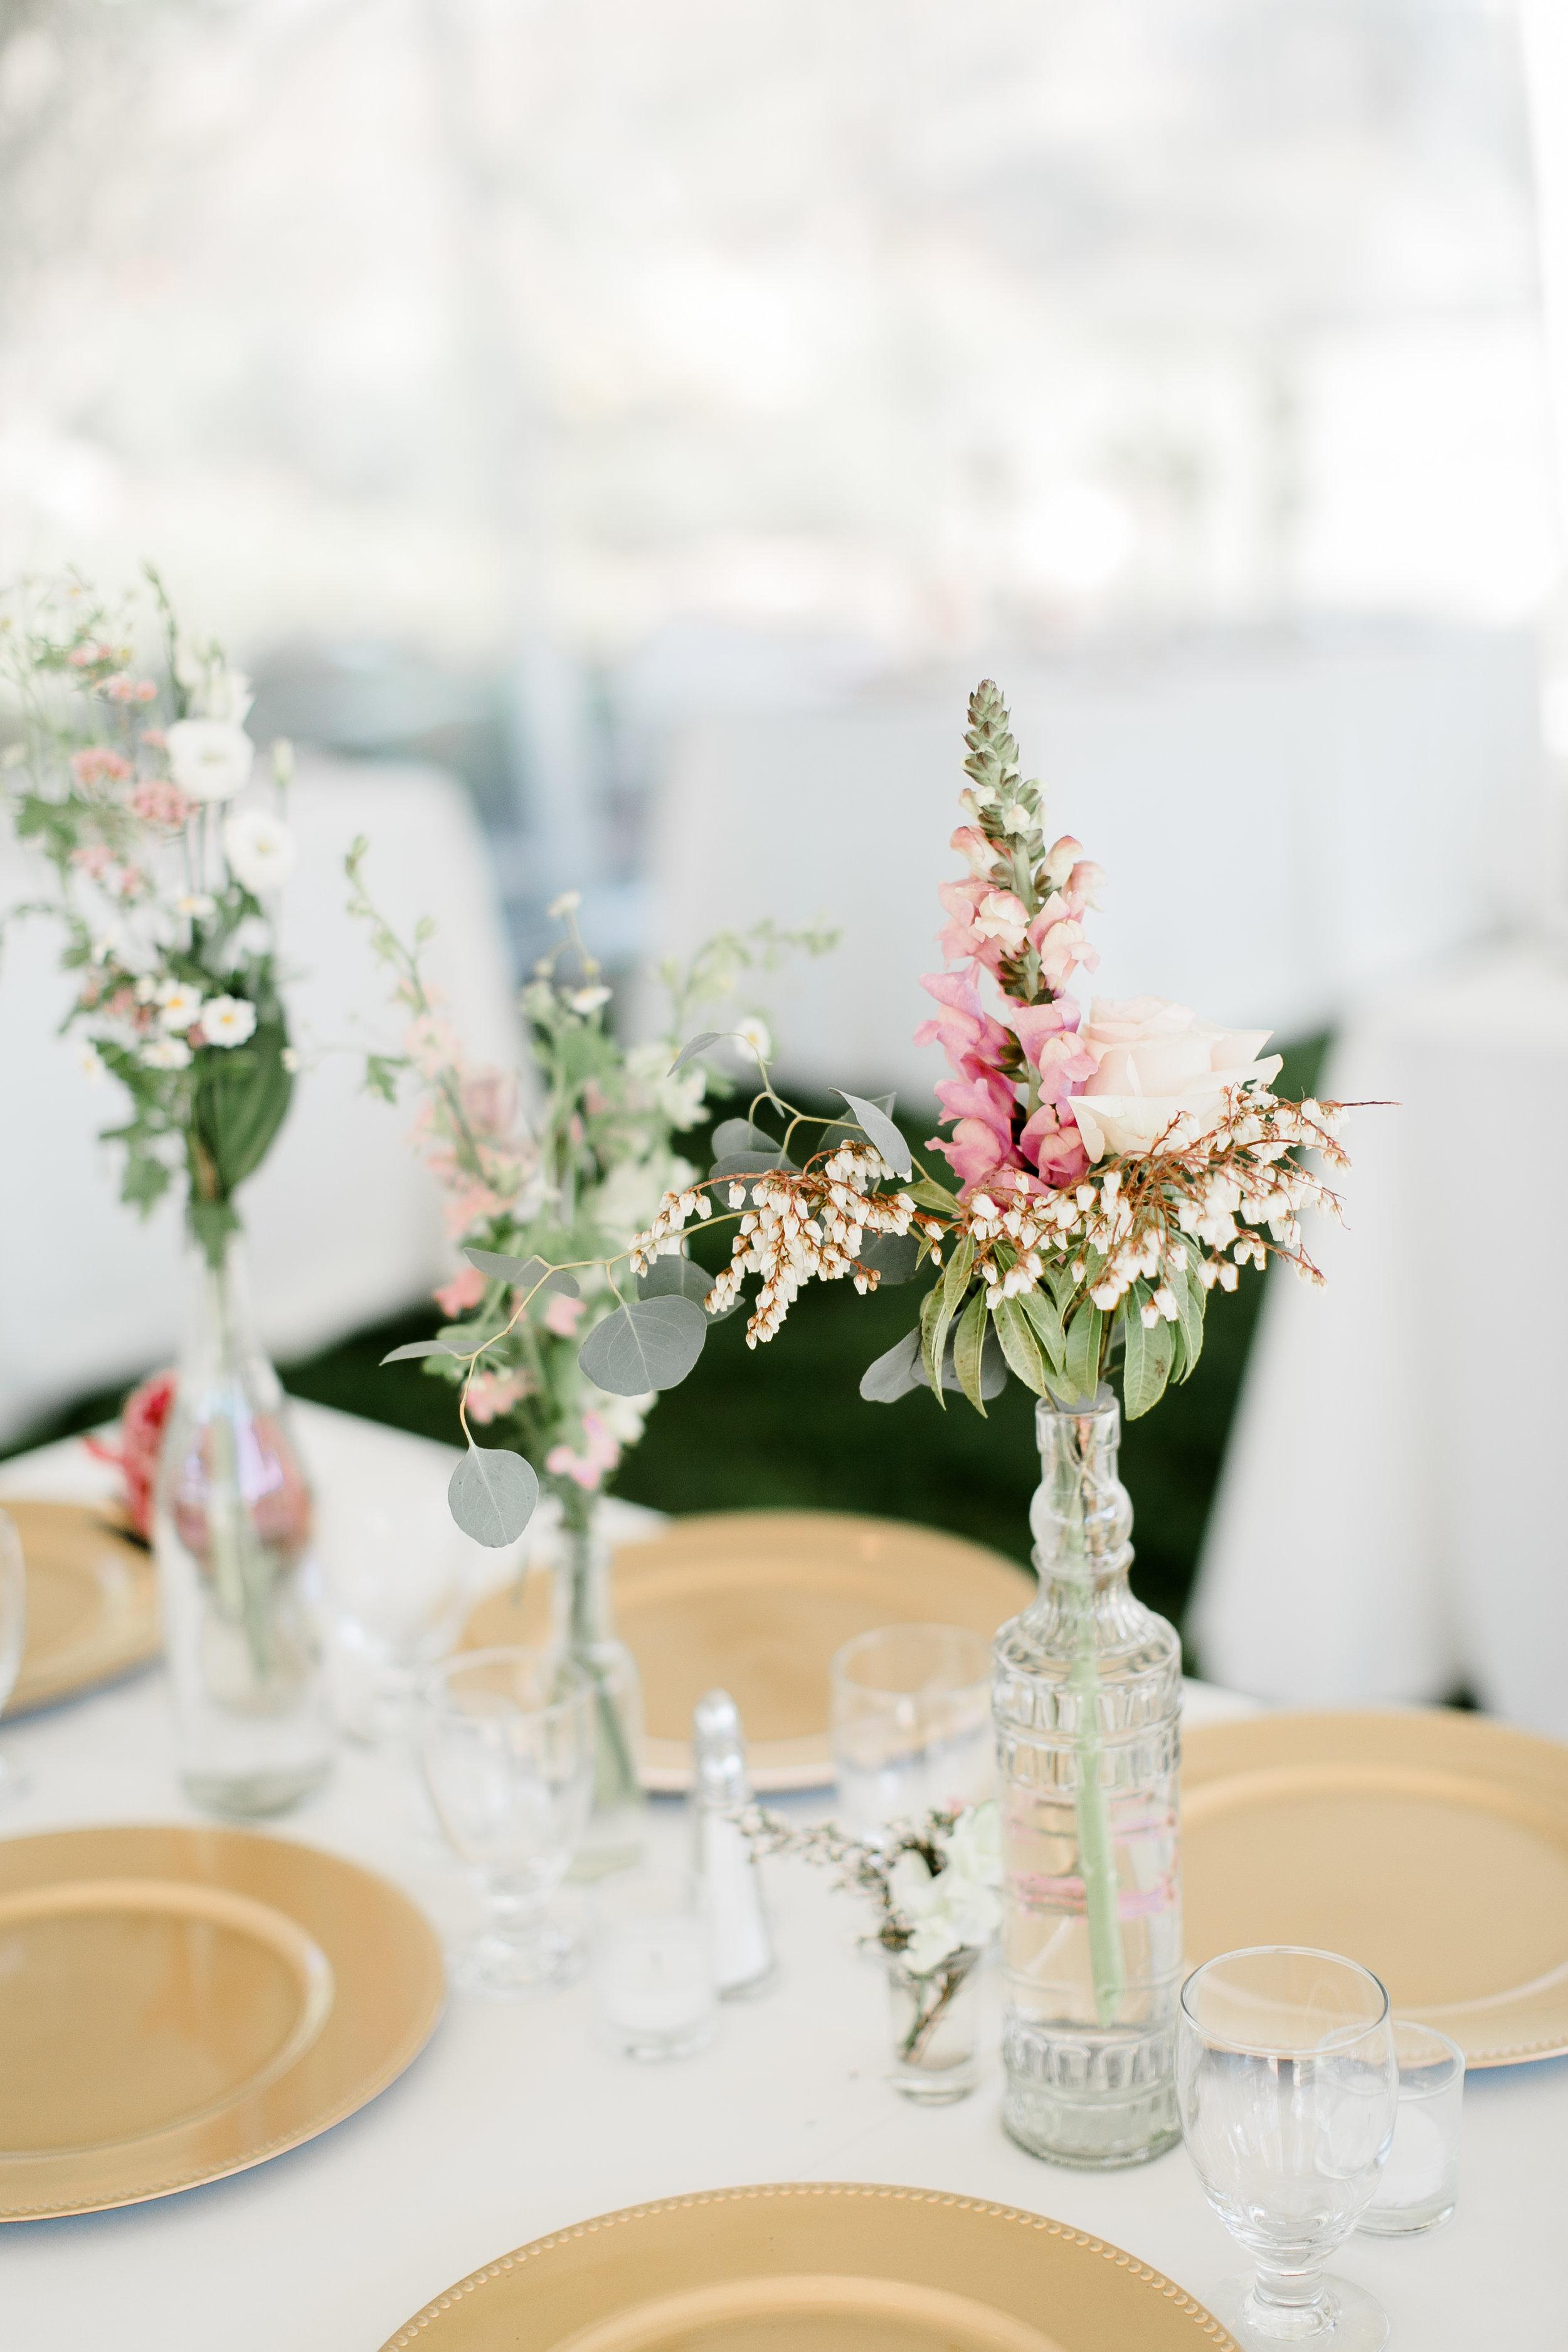 South-Coast-Botanic-Garden-Wedding-Planner7.jpg